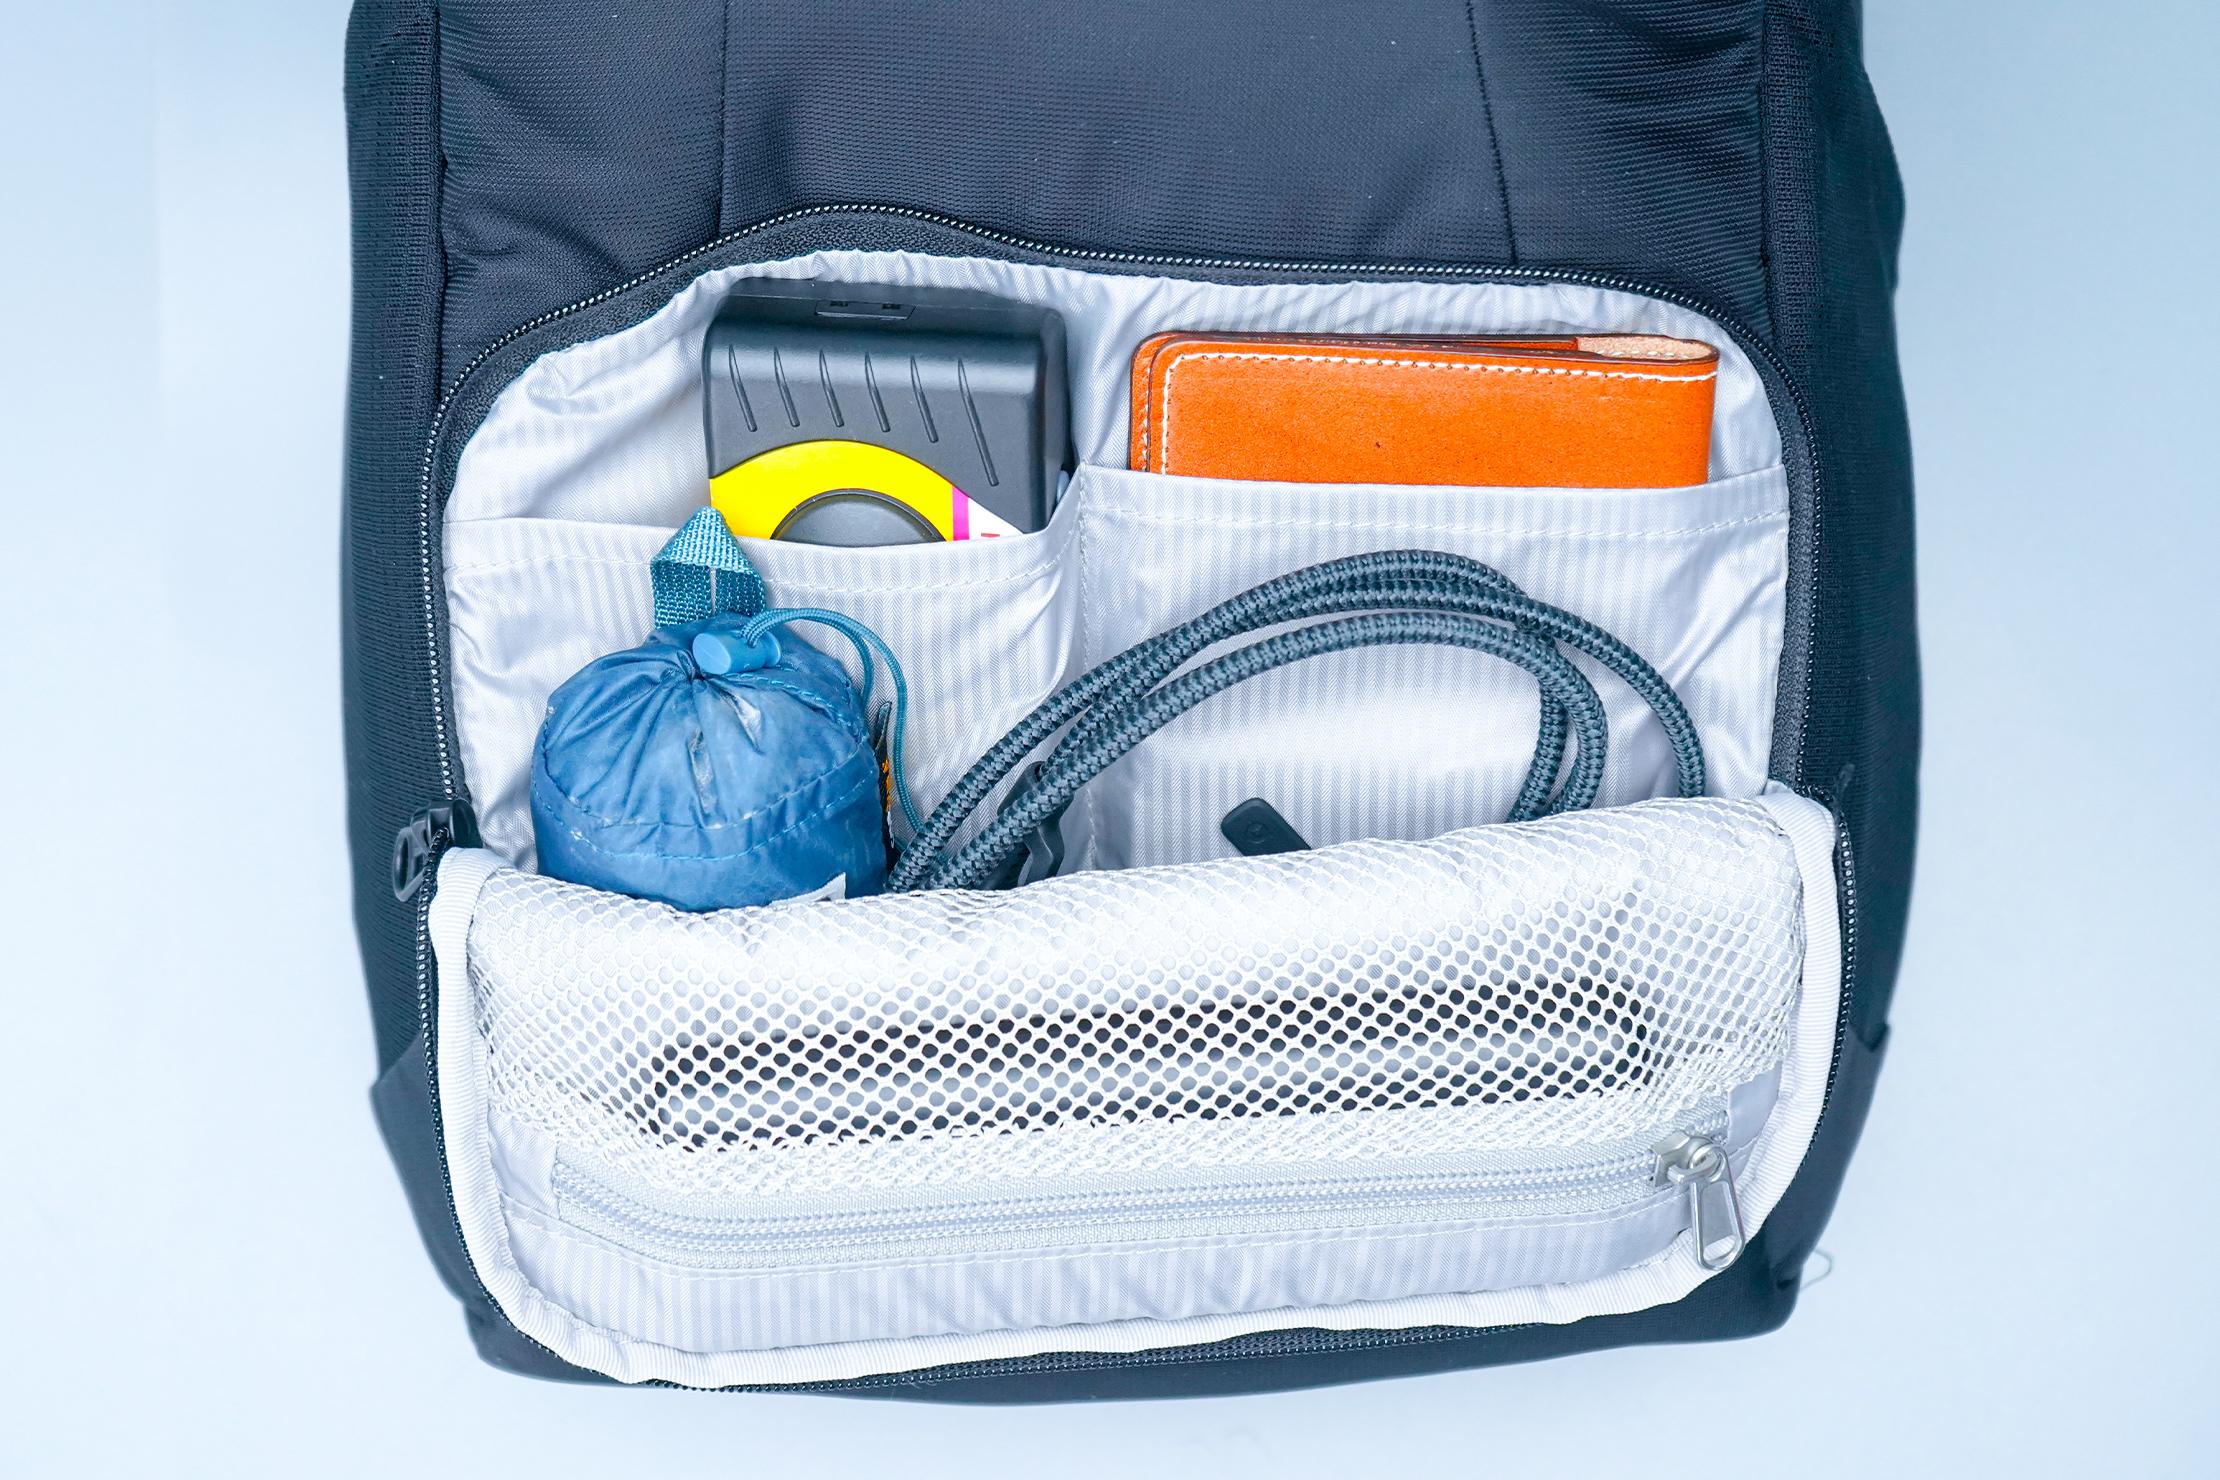 Pacsafe Metrosafe LS450 Anti-Theft Backpack Front Pocket